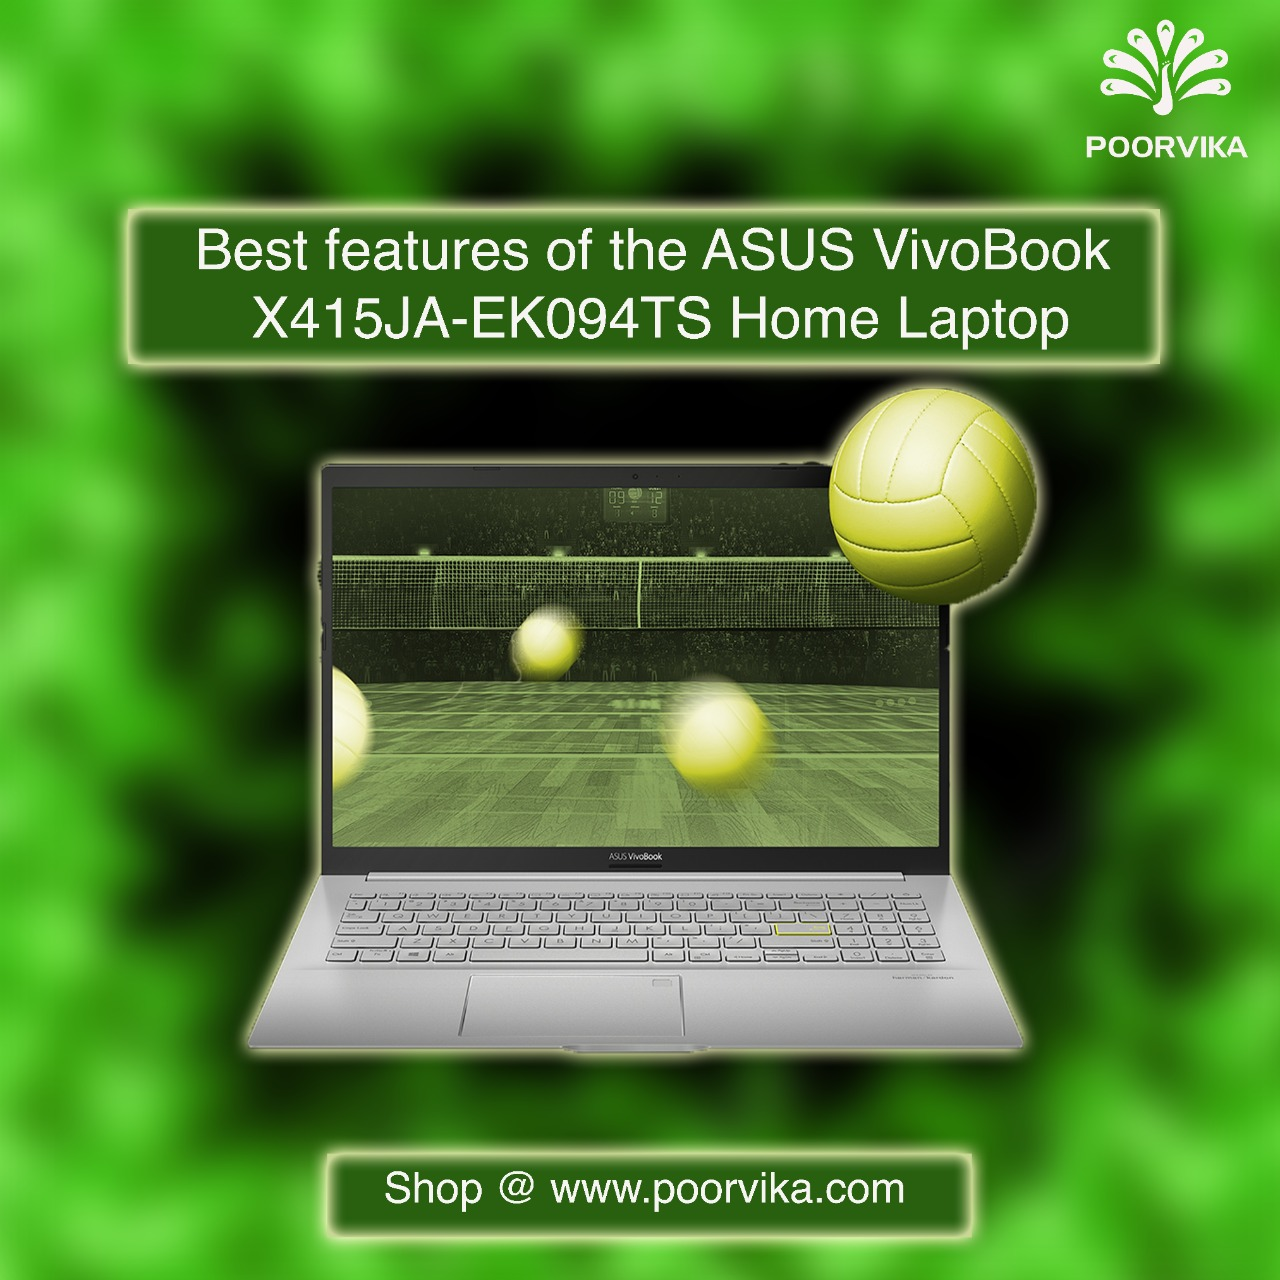 Best-features-of-the-ASUS-VivoBook-X415JA-EK094TS-Home-Laptop